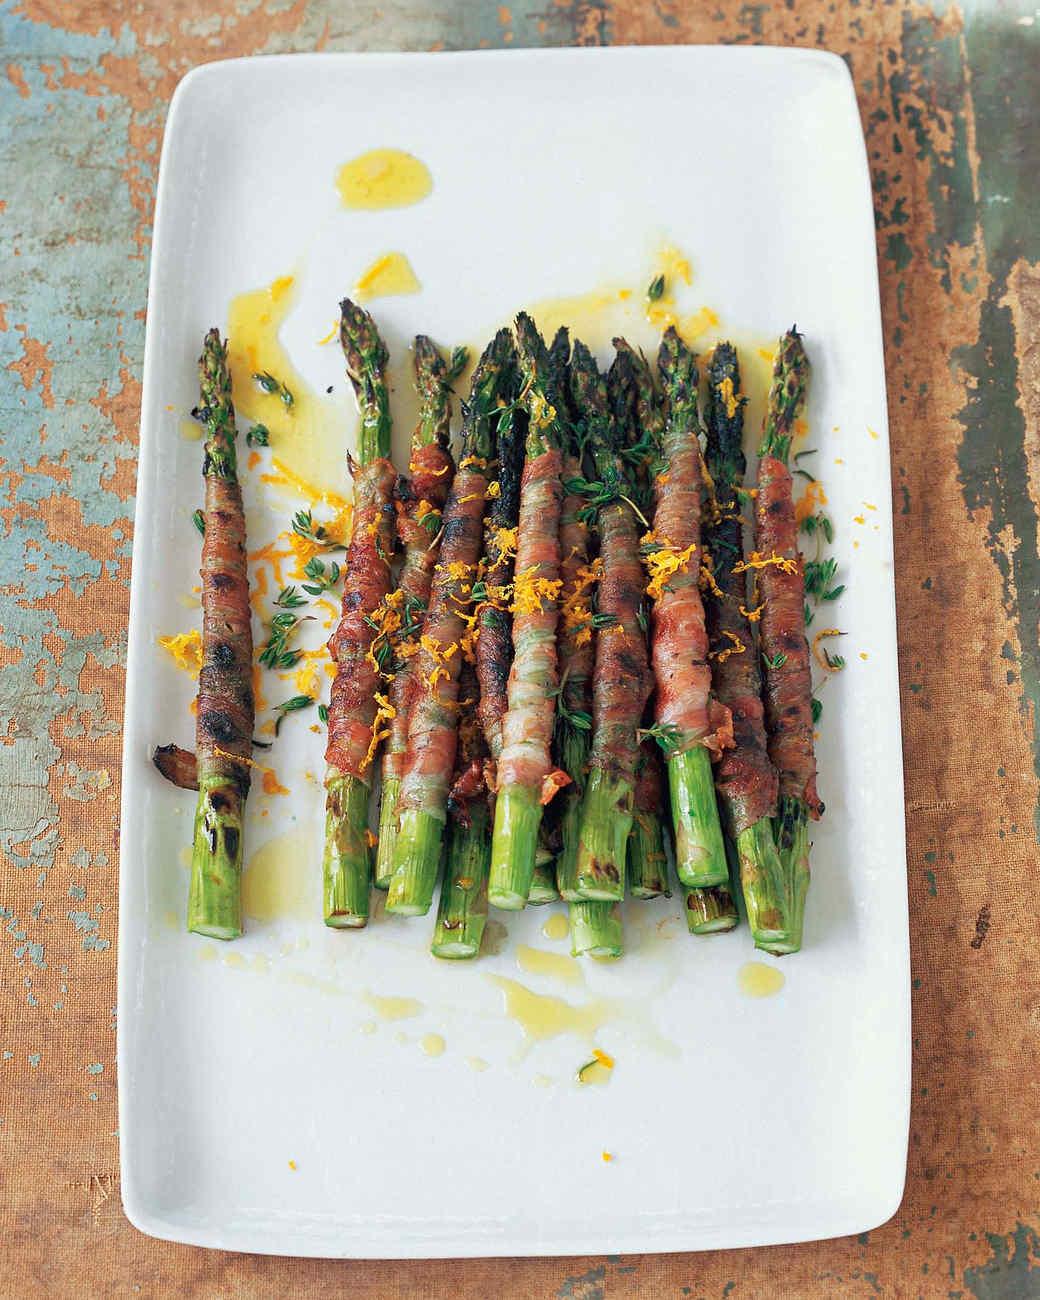 str_asparagus.jpg